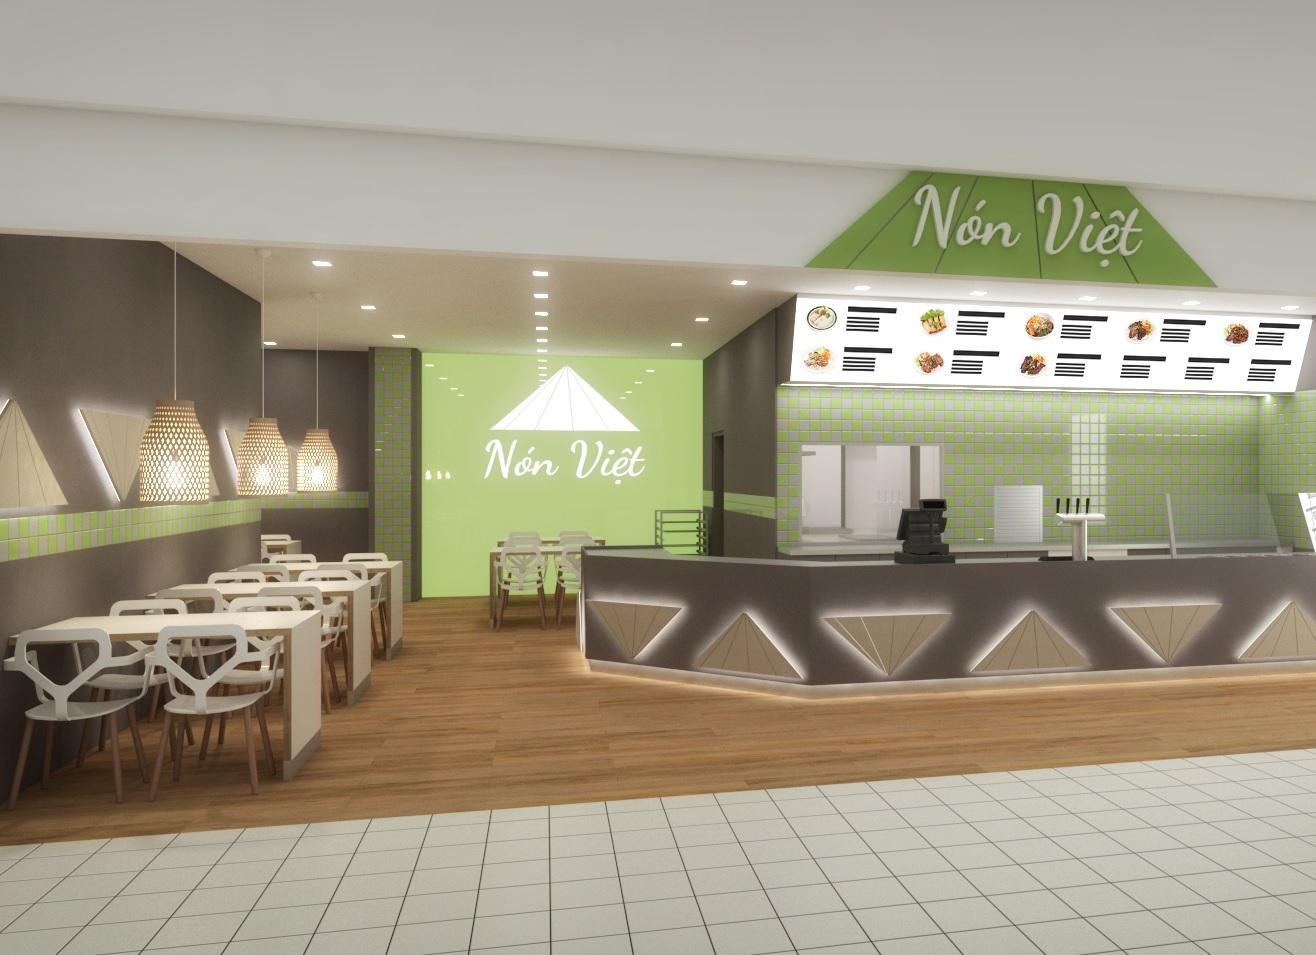 návrh interiéru vietnamského fast foodu